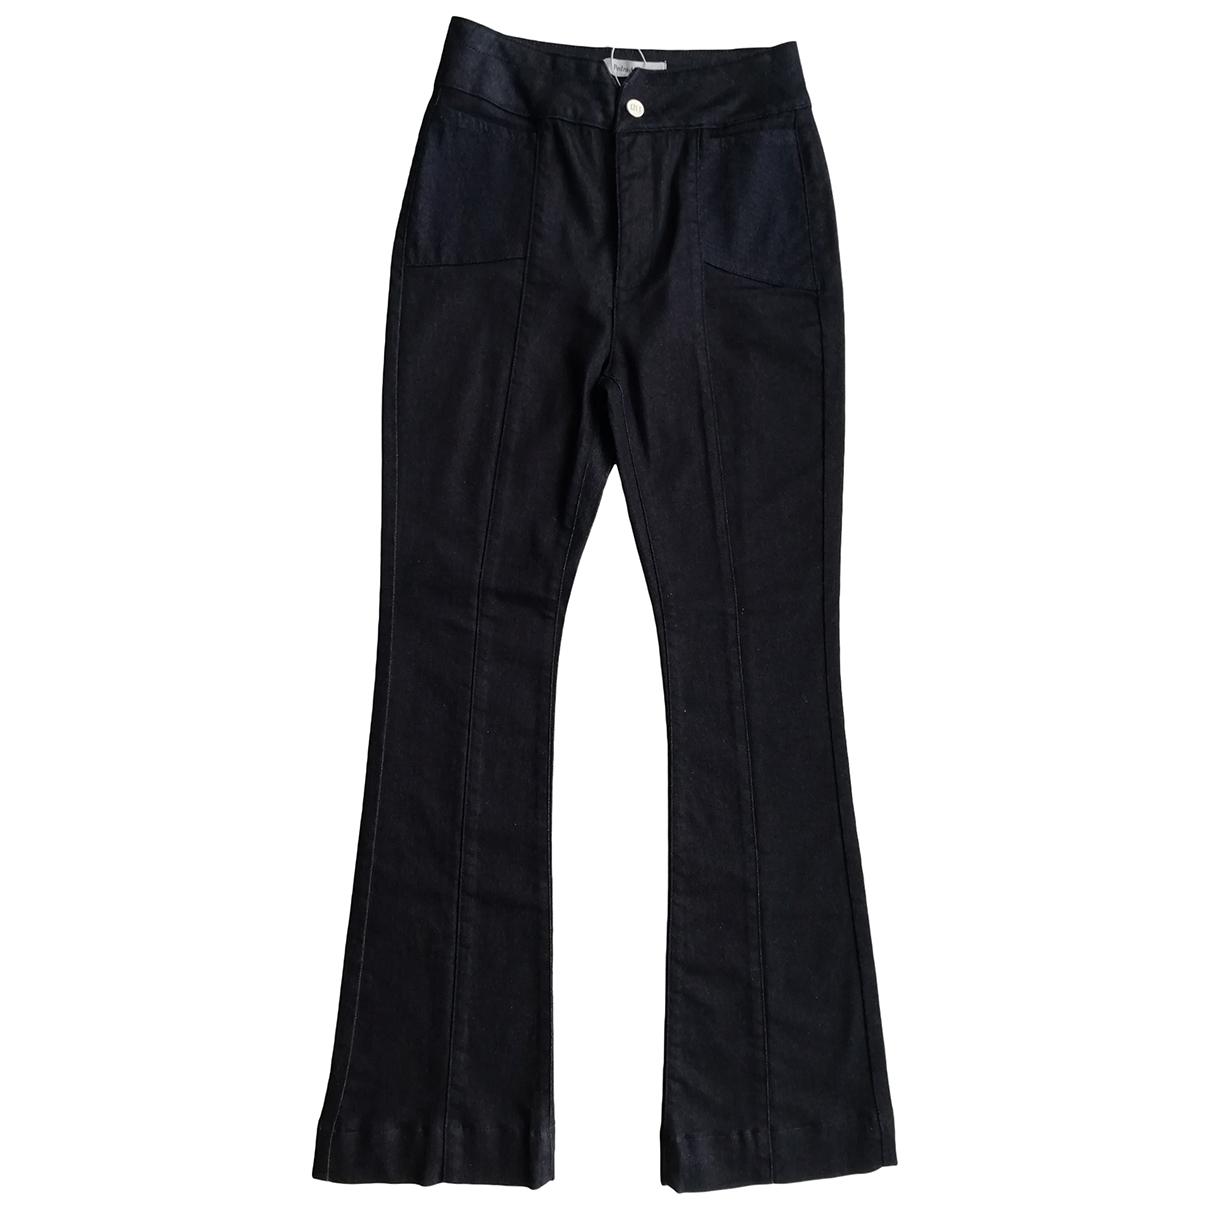 Pedro Del Hierro \N Navy Cotton - elasthane Jeans for Women 36 FR